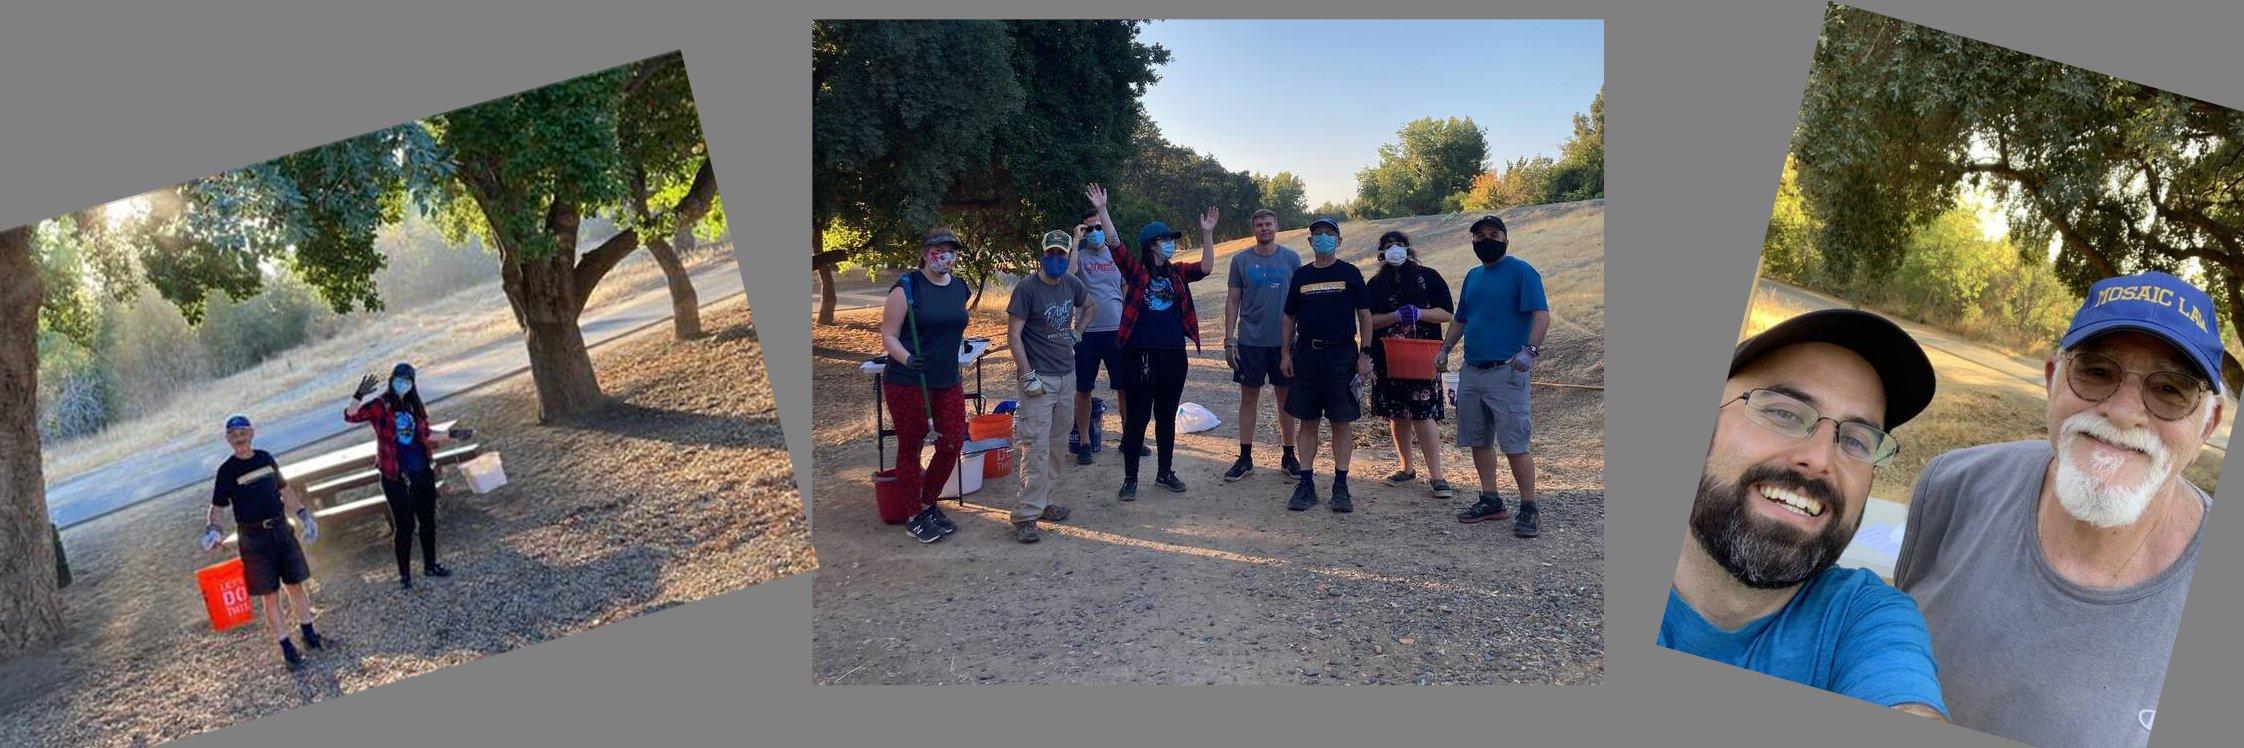 "<span class=""slider_title"">                                     Sustainability Club Parkway Cleanup                                </span>                                                                                                                                                                                       <span class=""slider_description"">To prepare for Tashlich</span>"